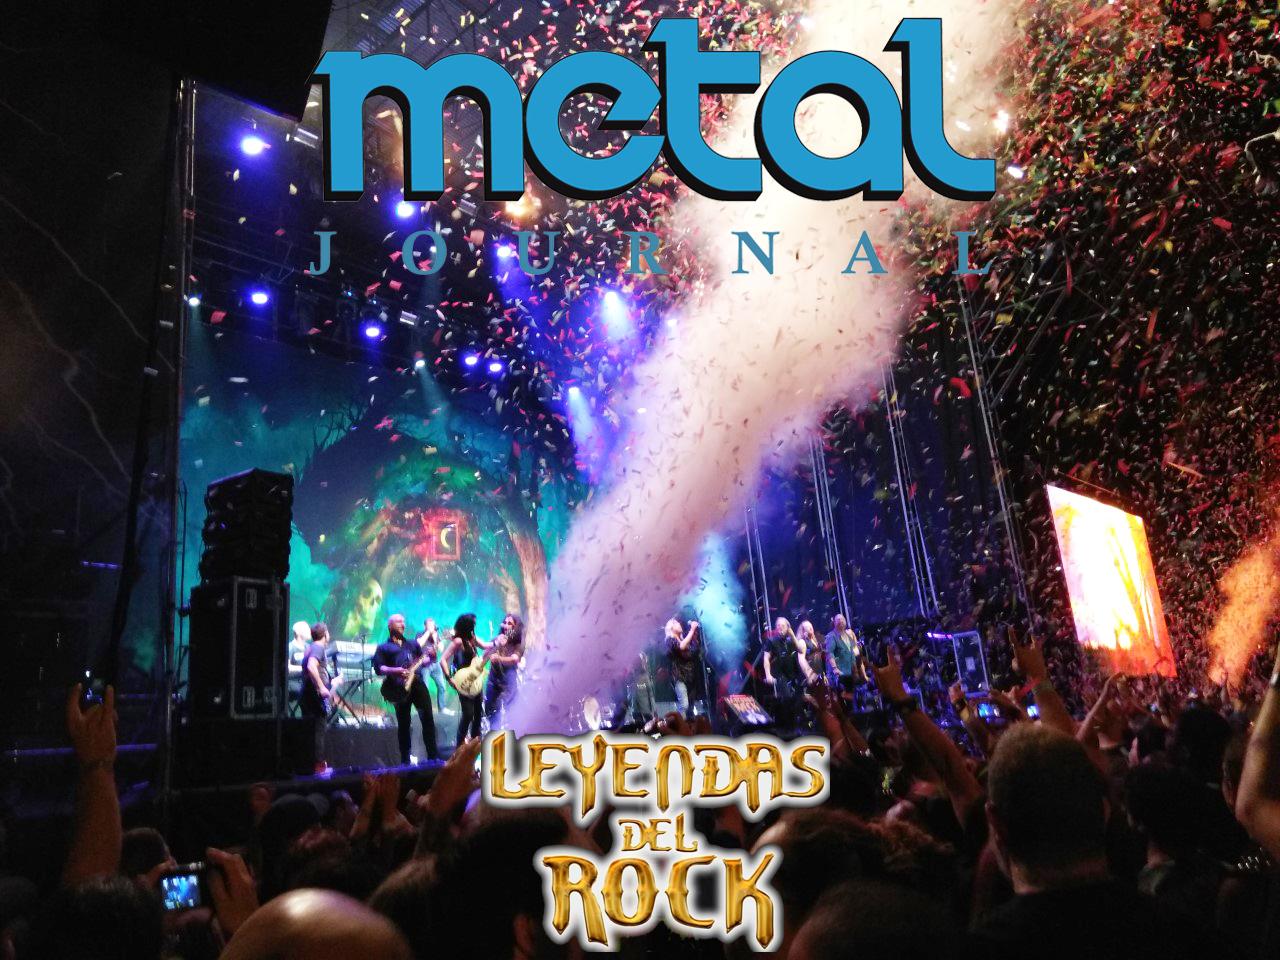 leyendas del rock 2019 metal journal pic 9